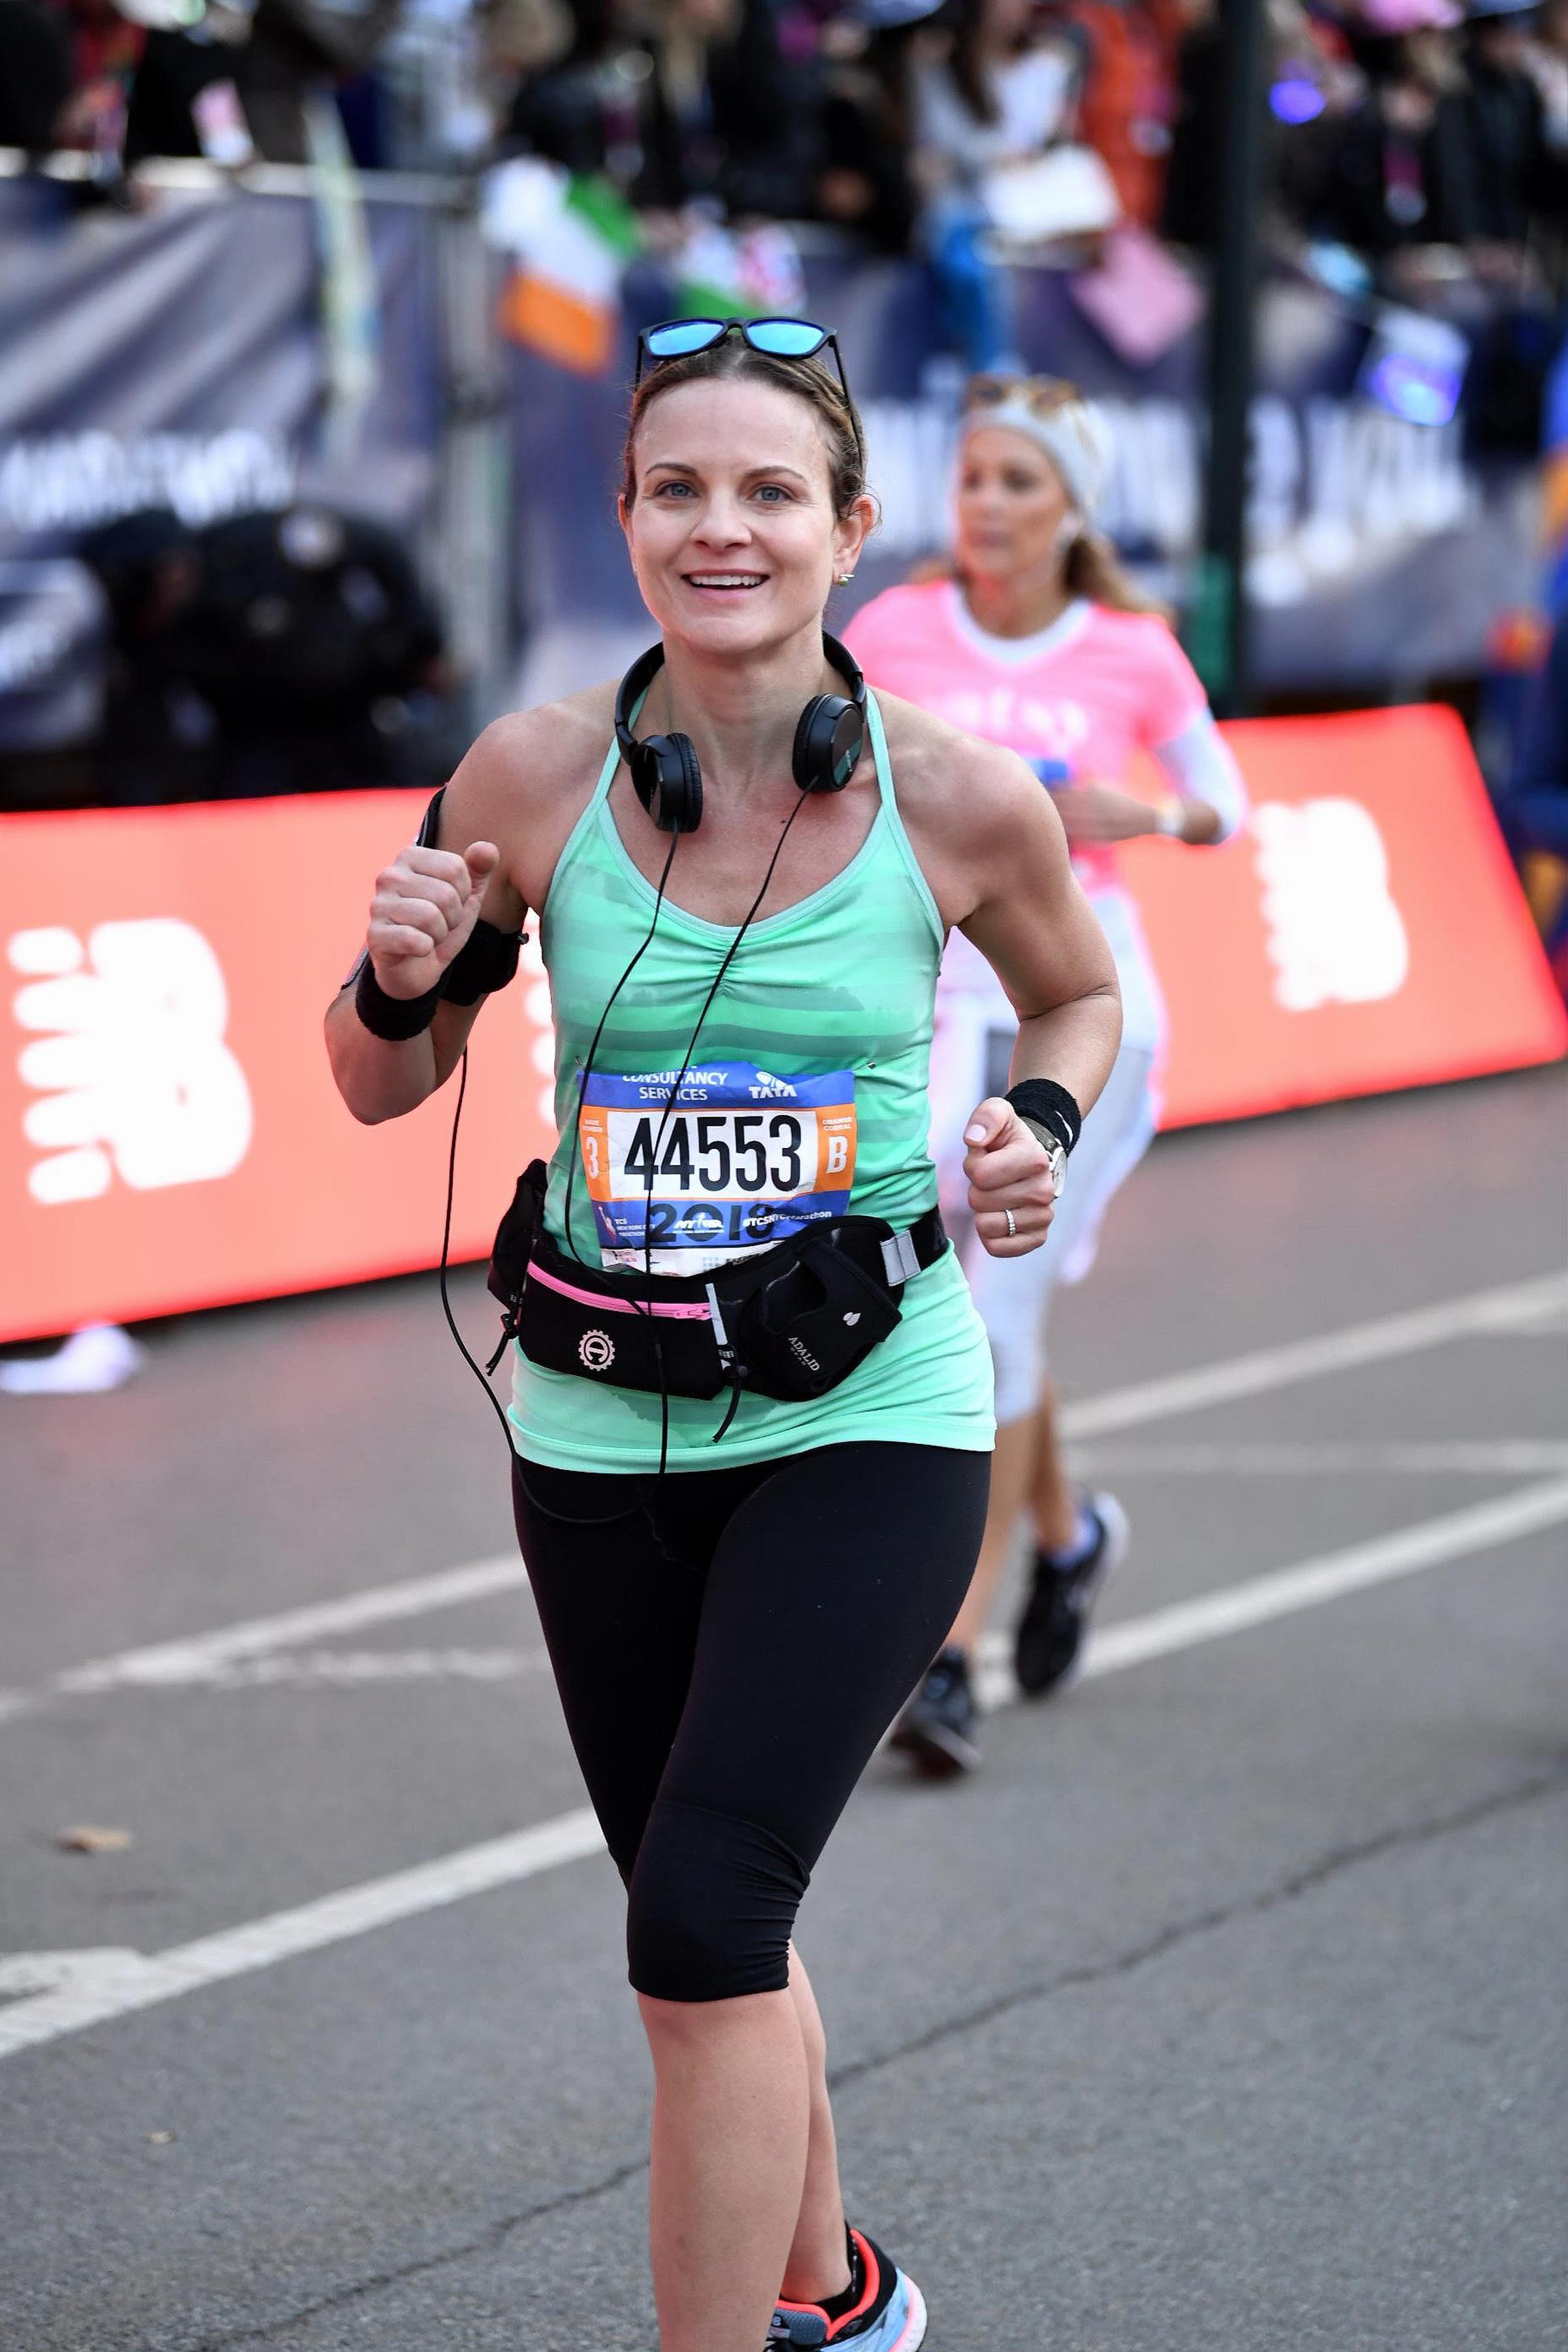 Running in the NYC Marathon, Nov. 4 2018